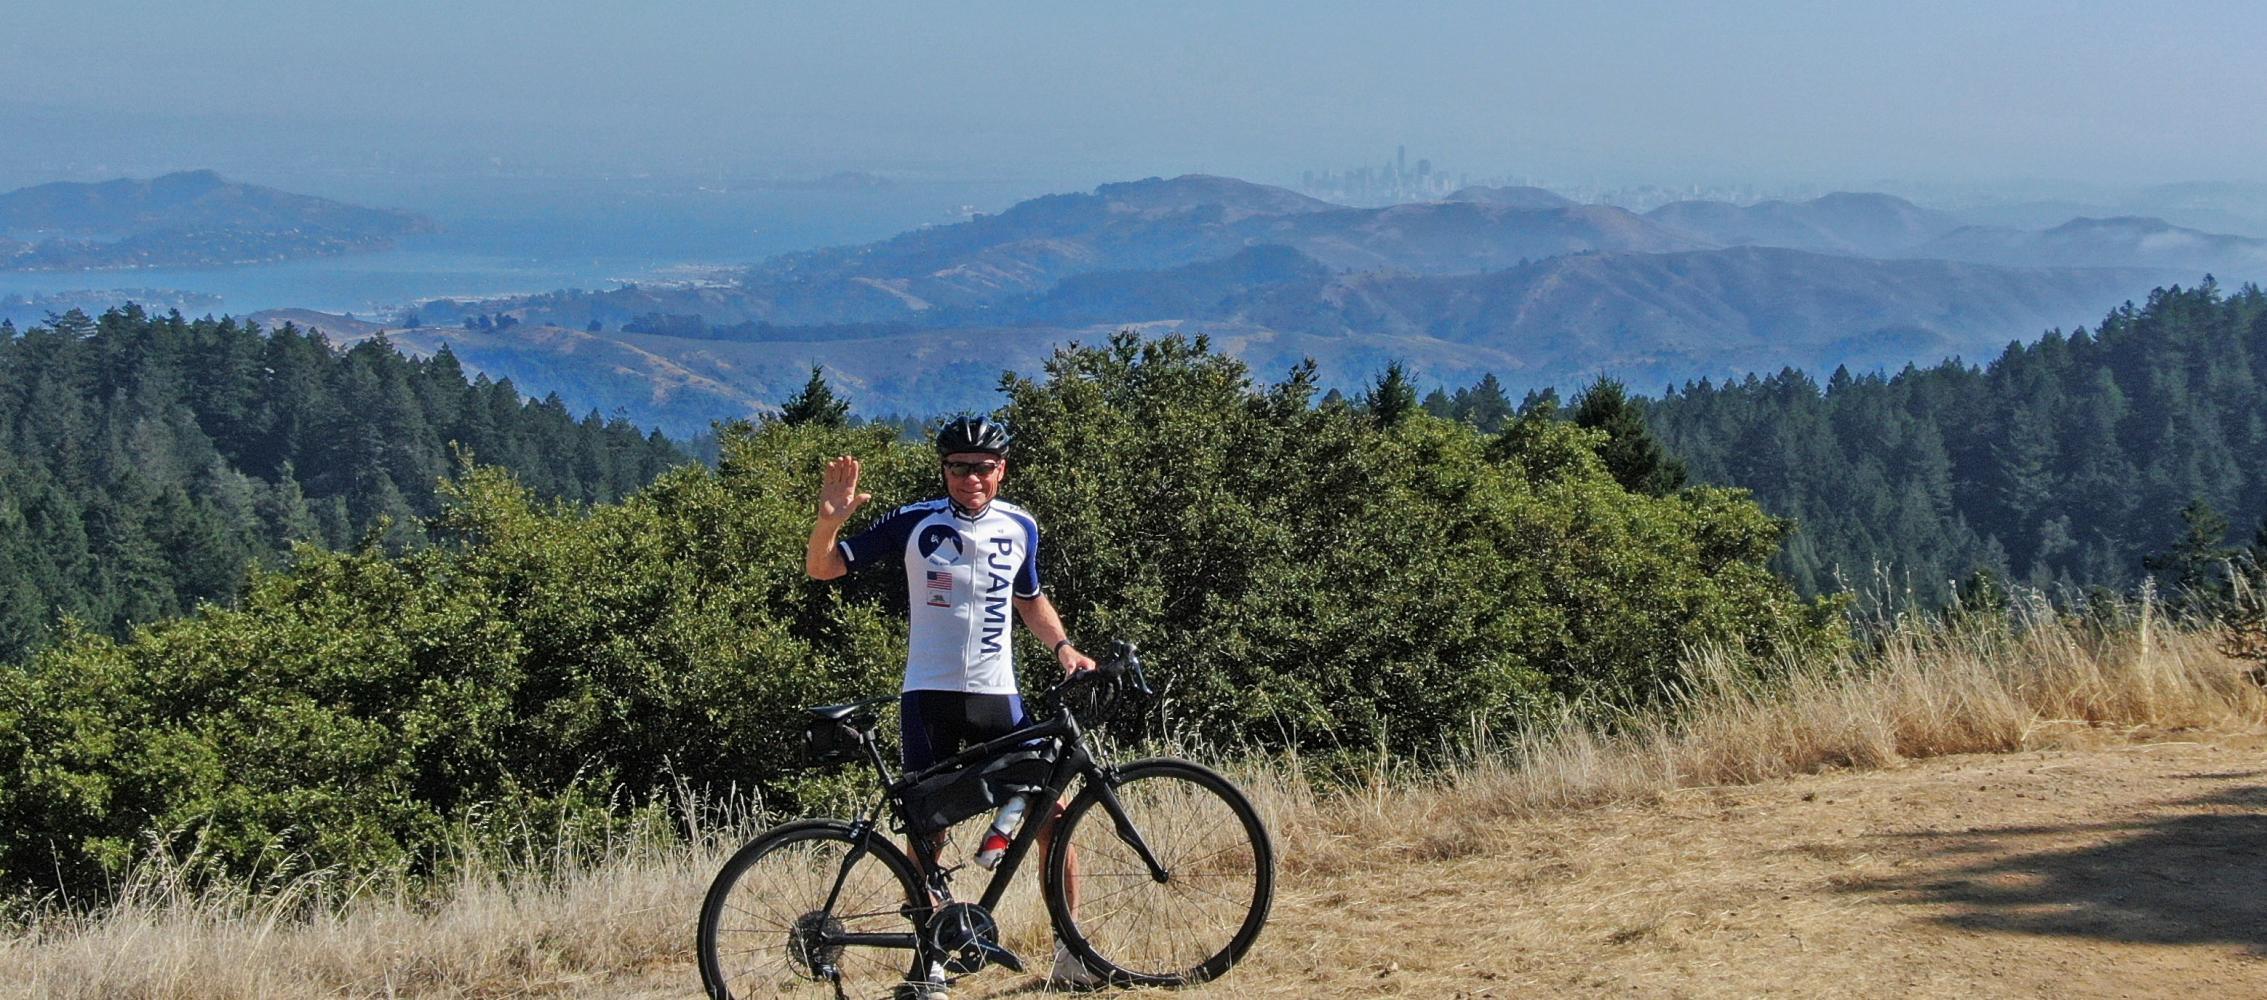 Mt. Tam via Panoramic Hwy North Bike Climb - PJAMM Cycling